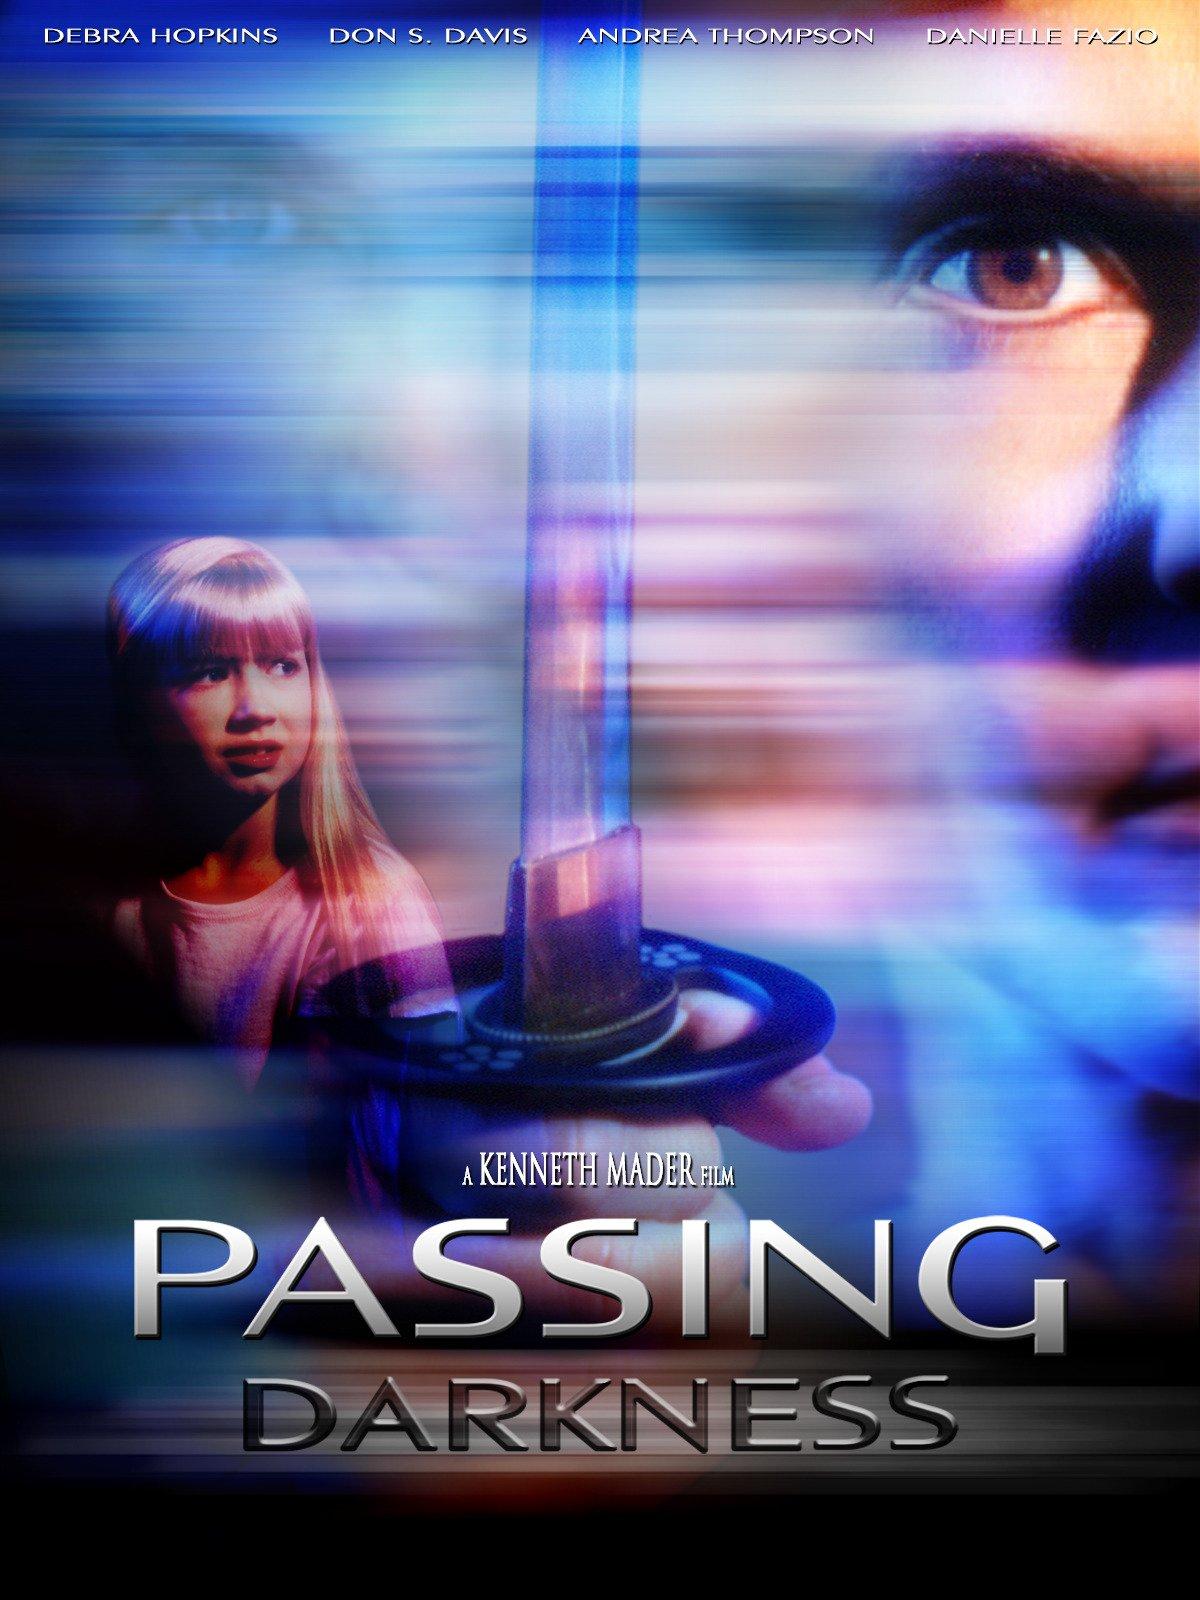 Passing Darkness